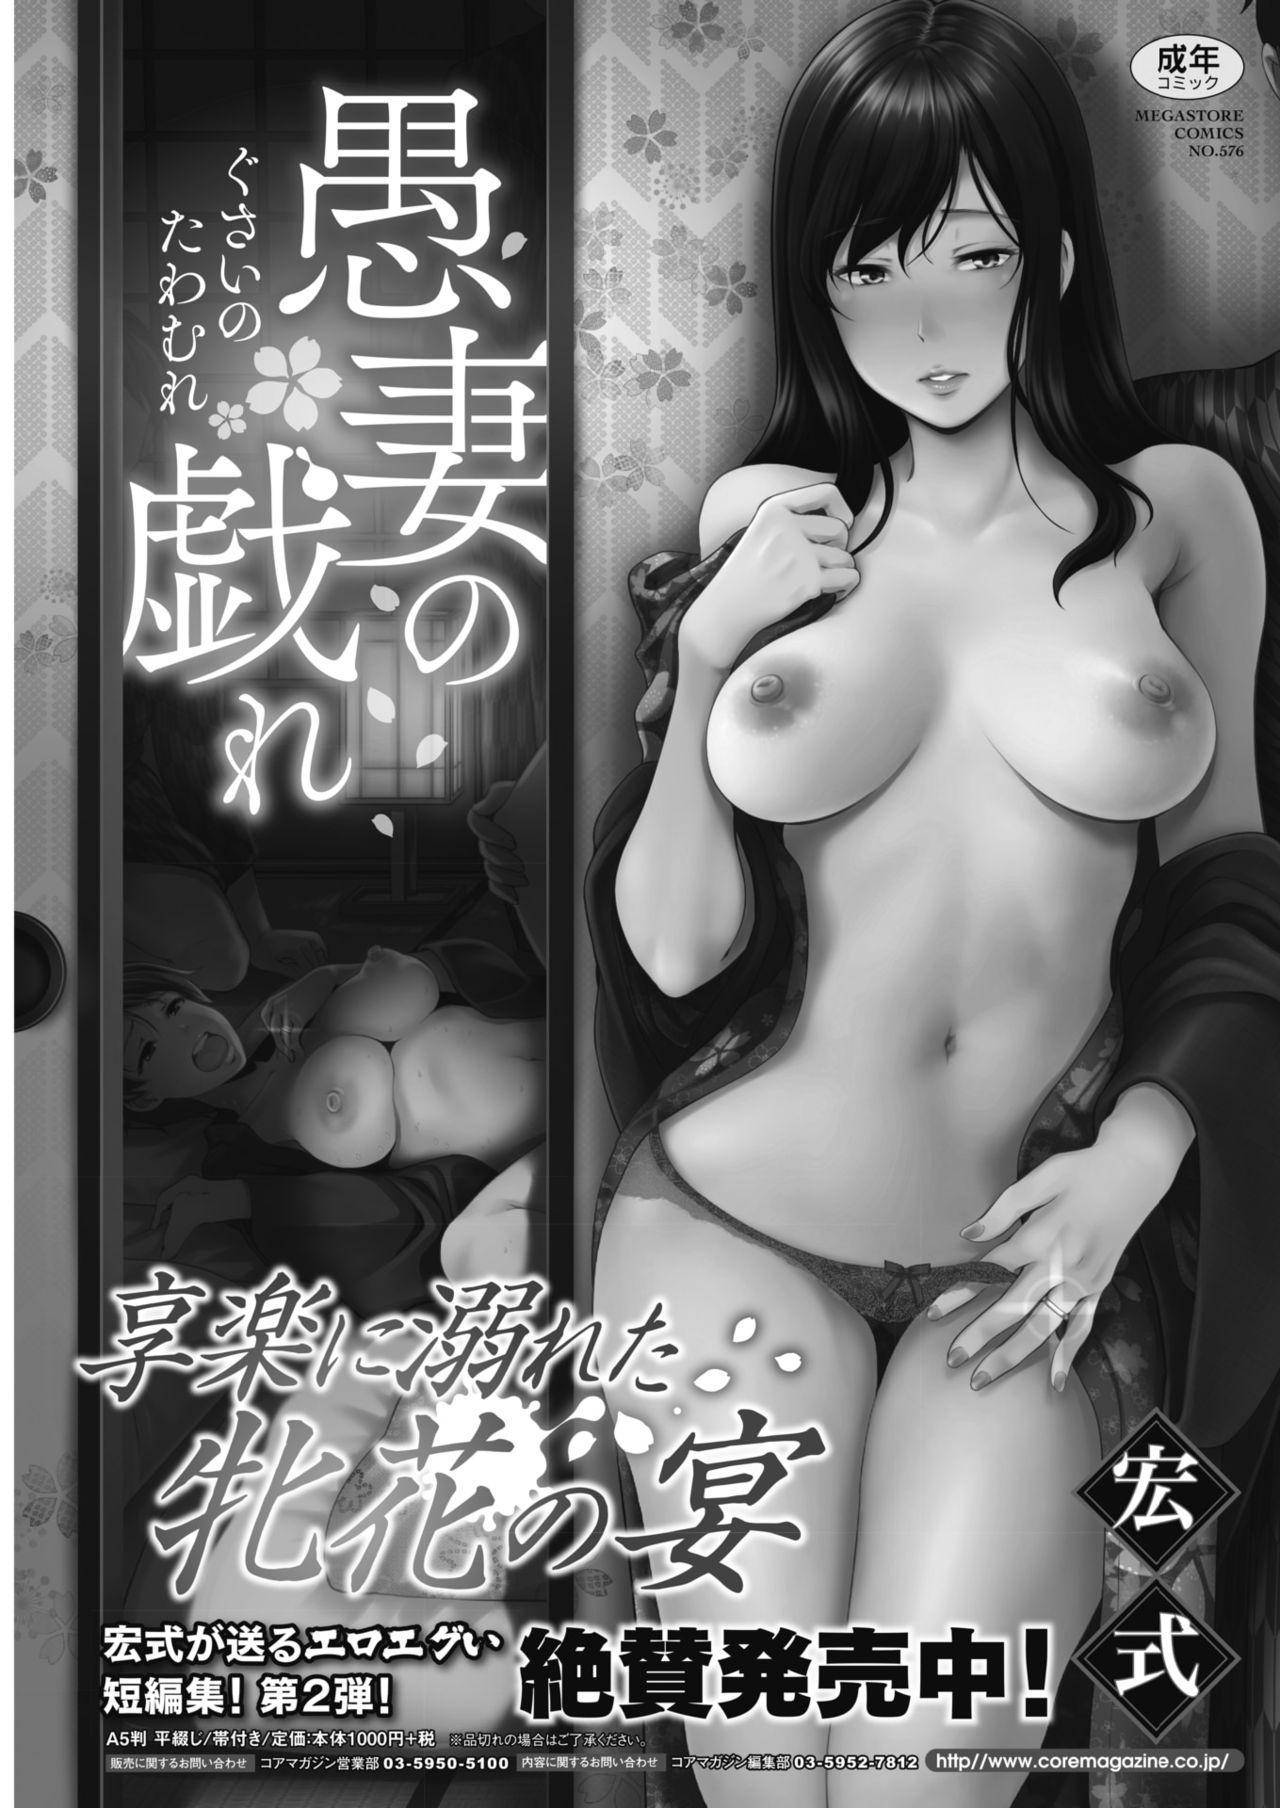 COMIC HOTMiLK Koime Vol. 17 245